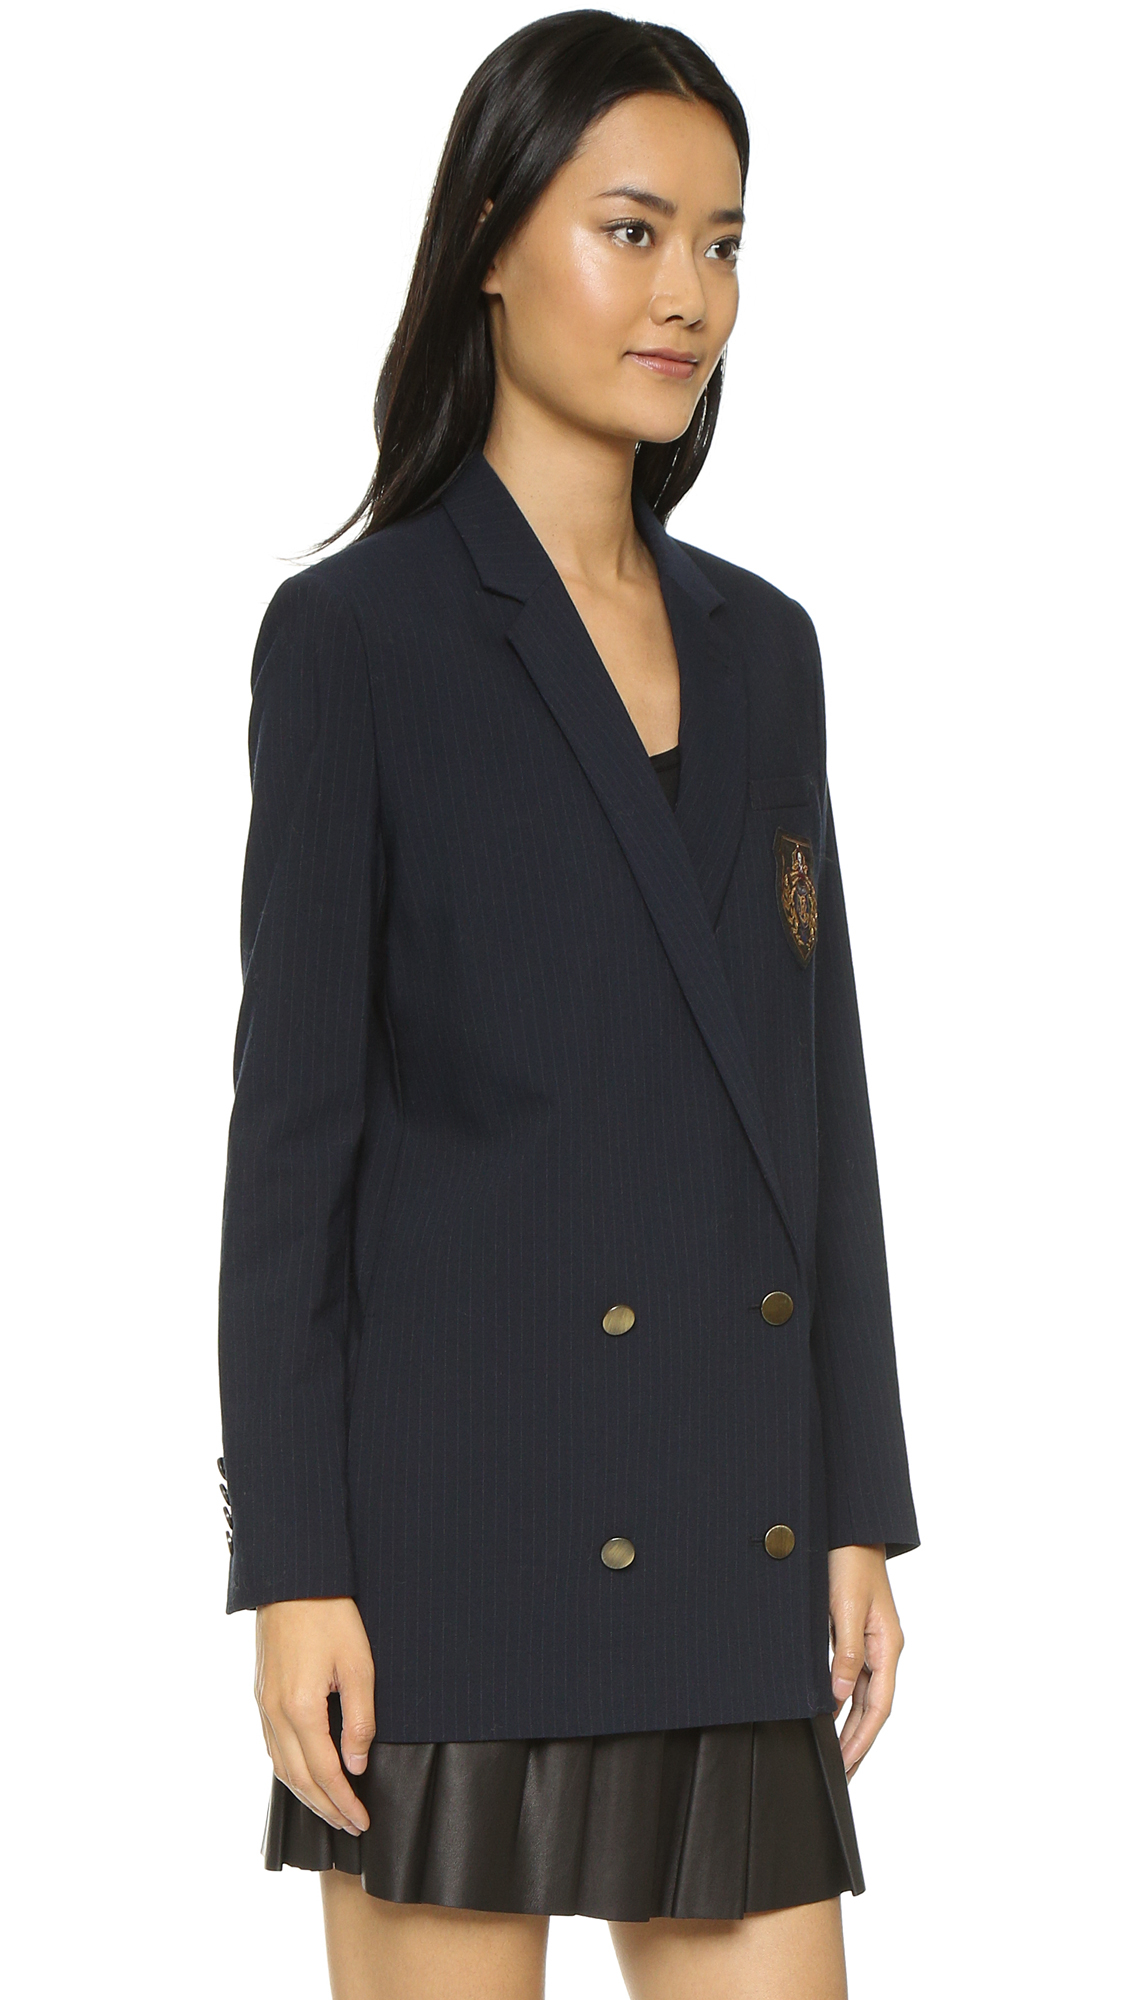 Lyst The Kooples Double Breasted Tennis Stripe Jacket Navy In Blue